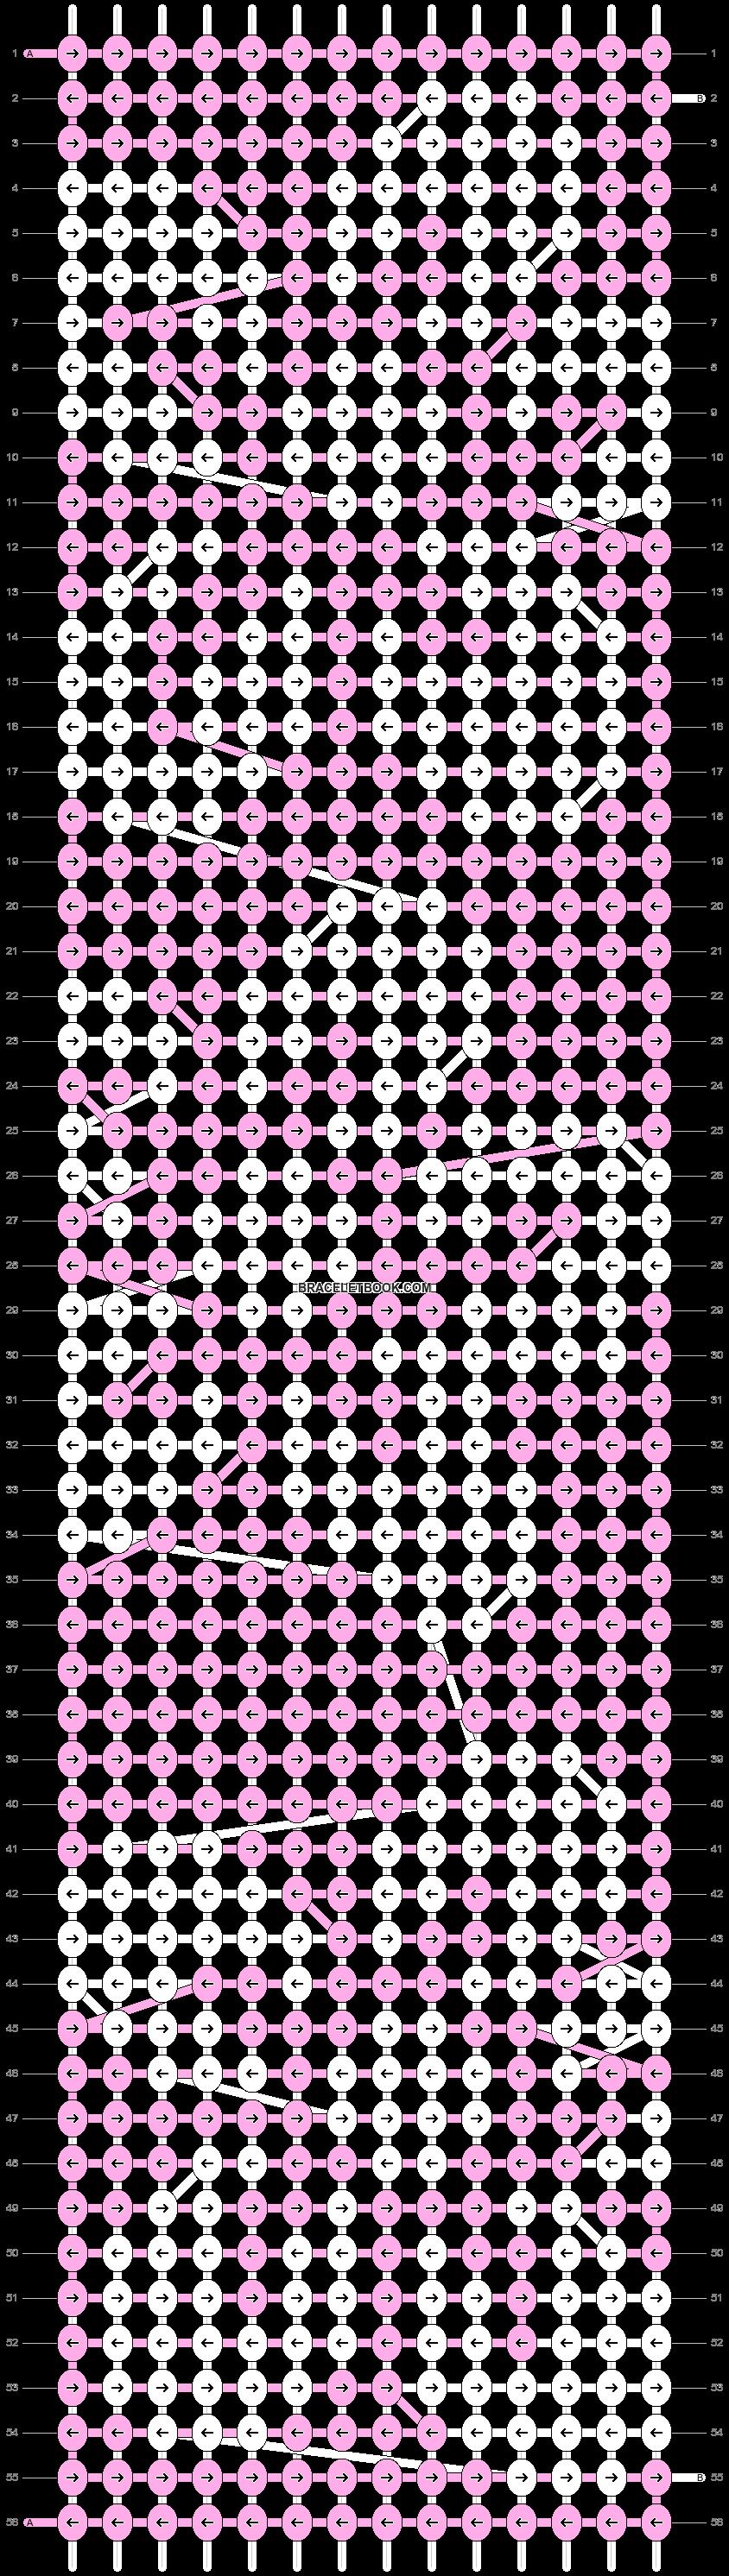 Alpha pattern #43453 pattern